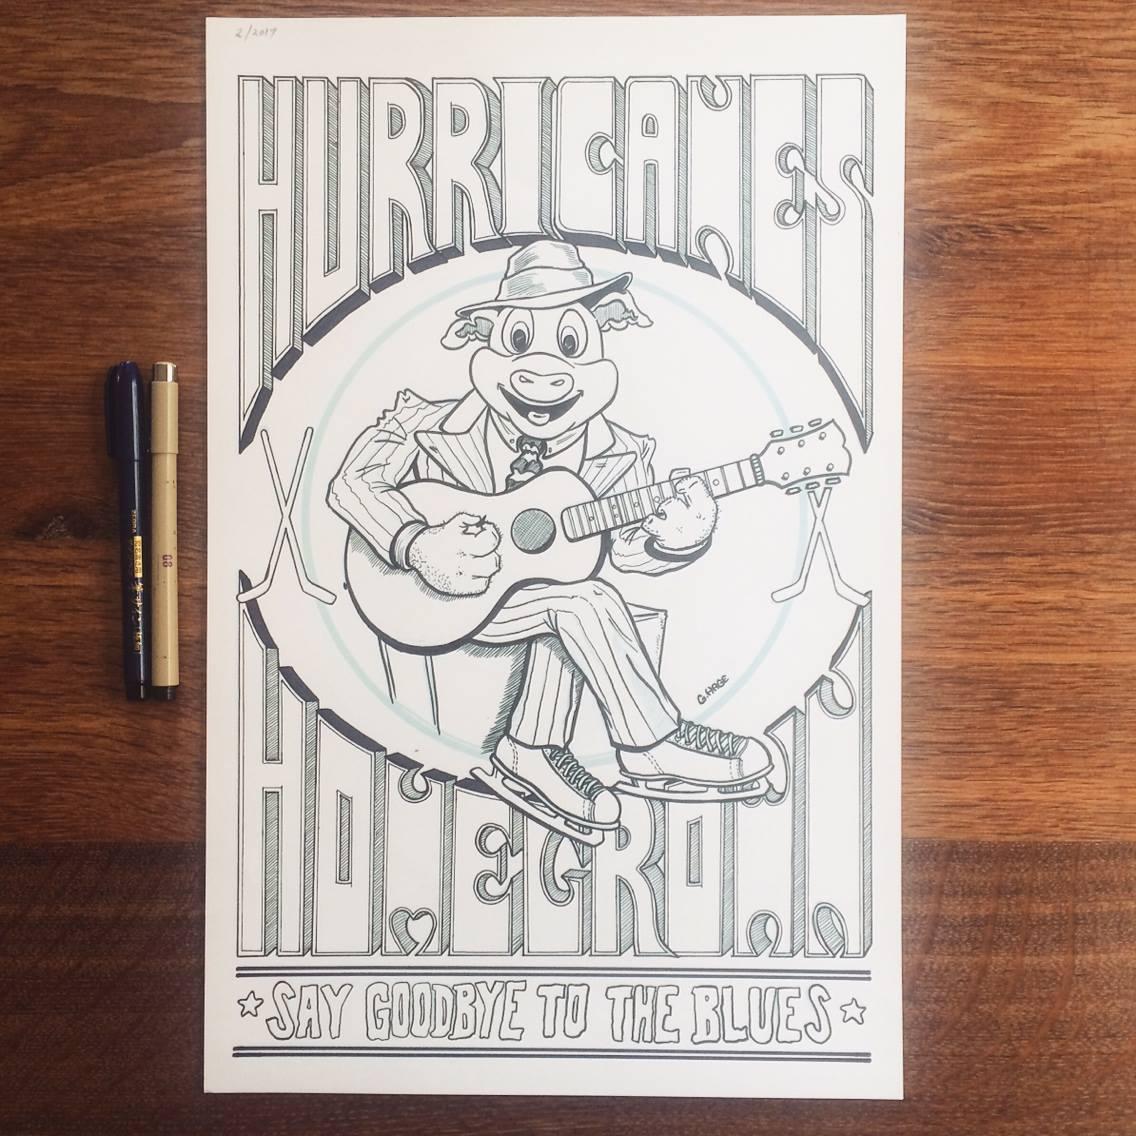 GeorgeHage_HurricanesBlues-Ink.jpg